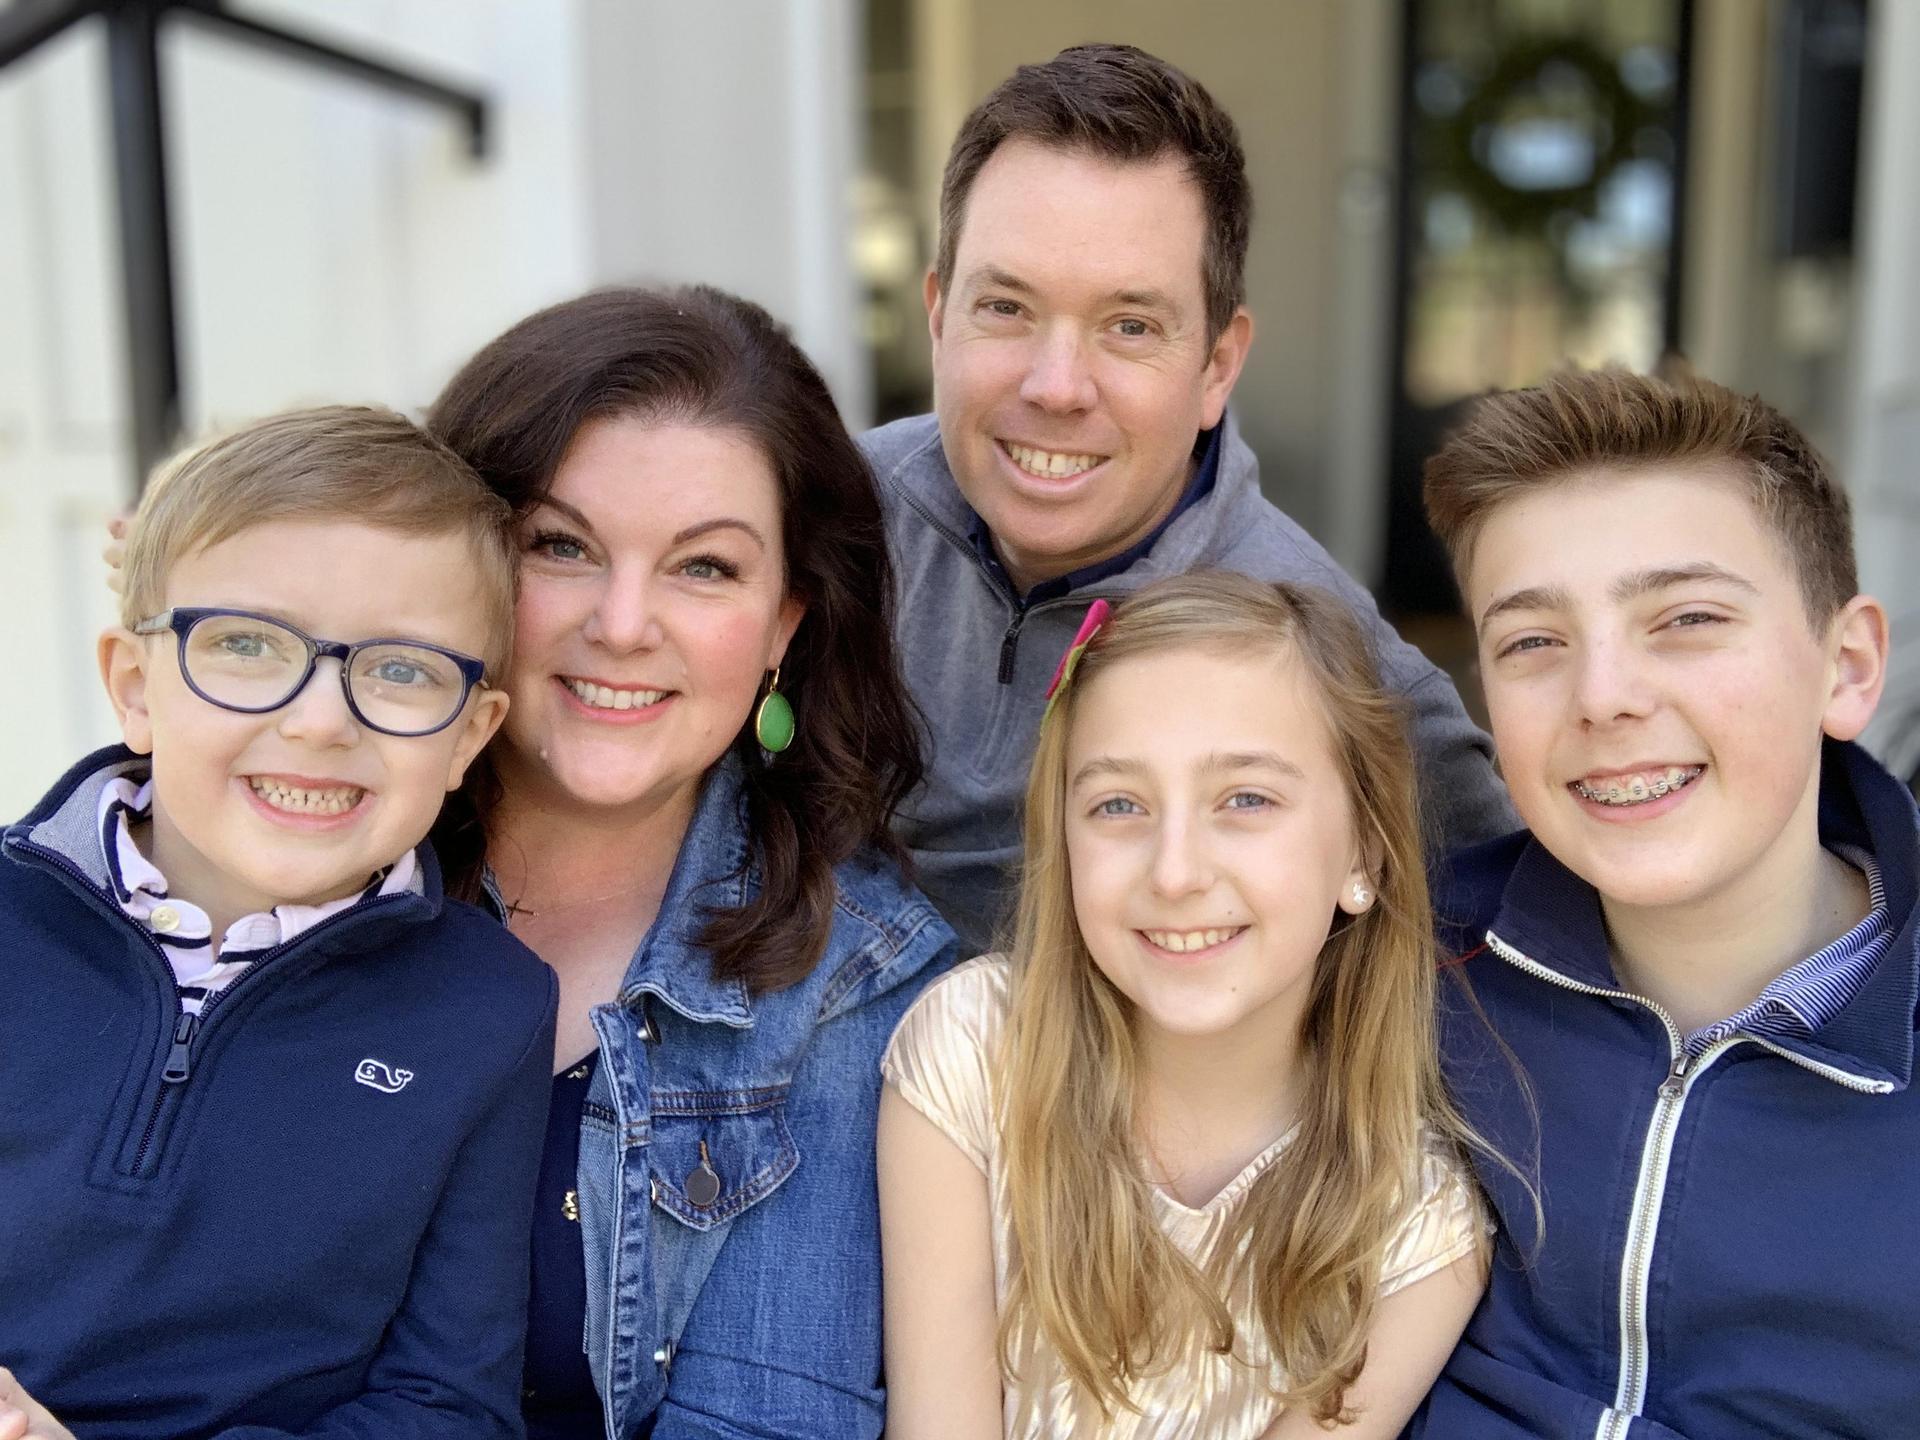 Uffelman family